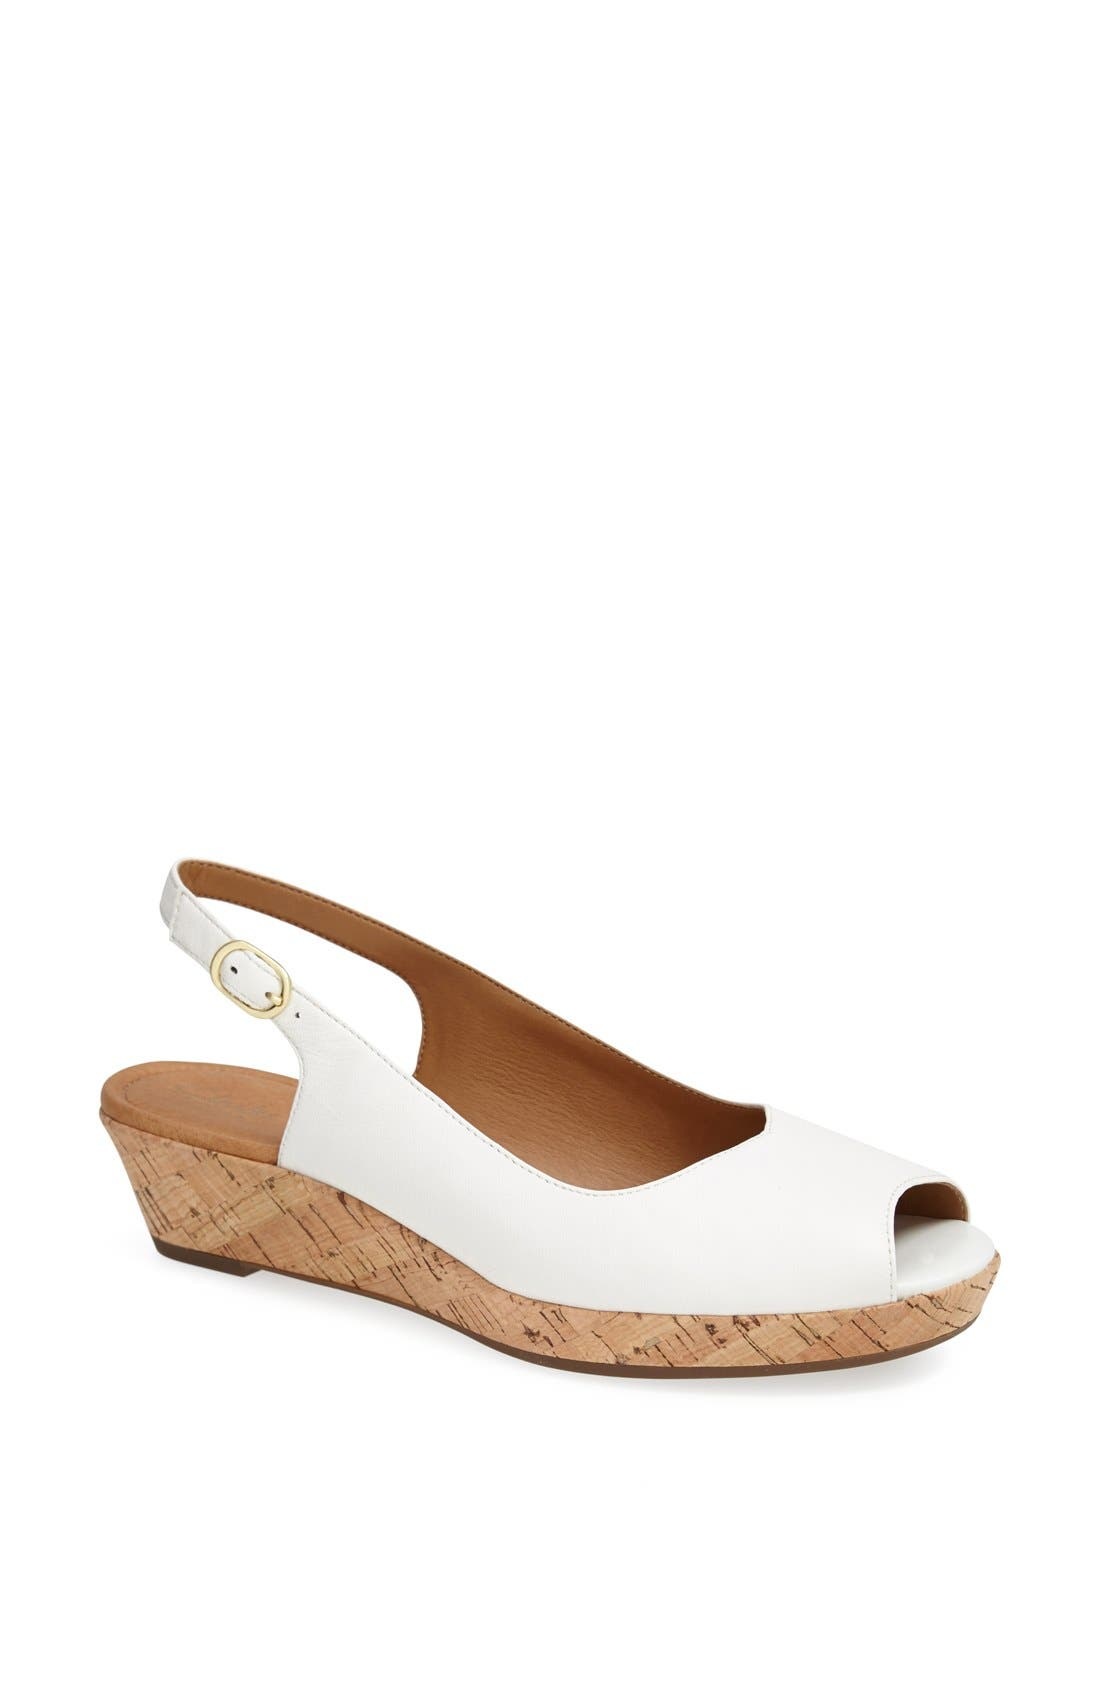 Main Image - Clarks® 'Orlena Currant' Sandal